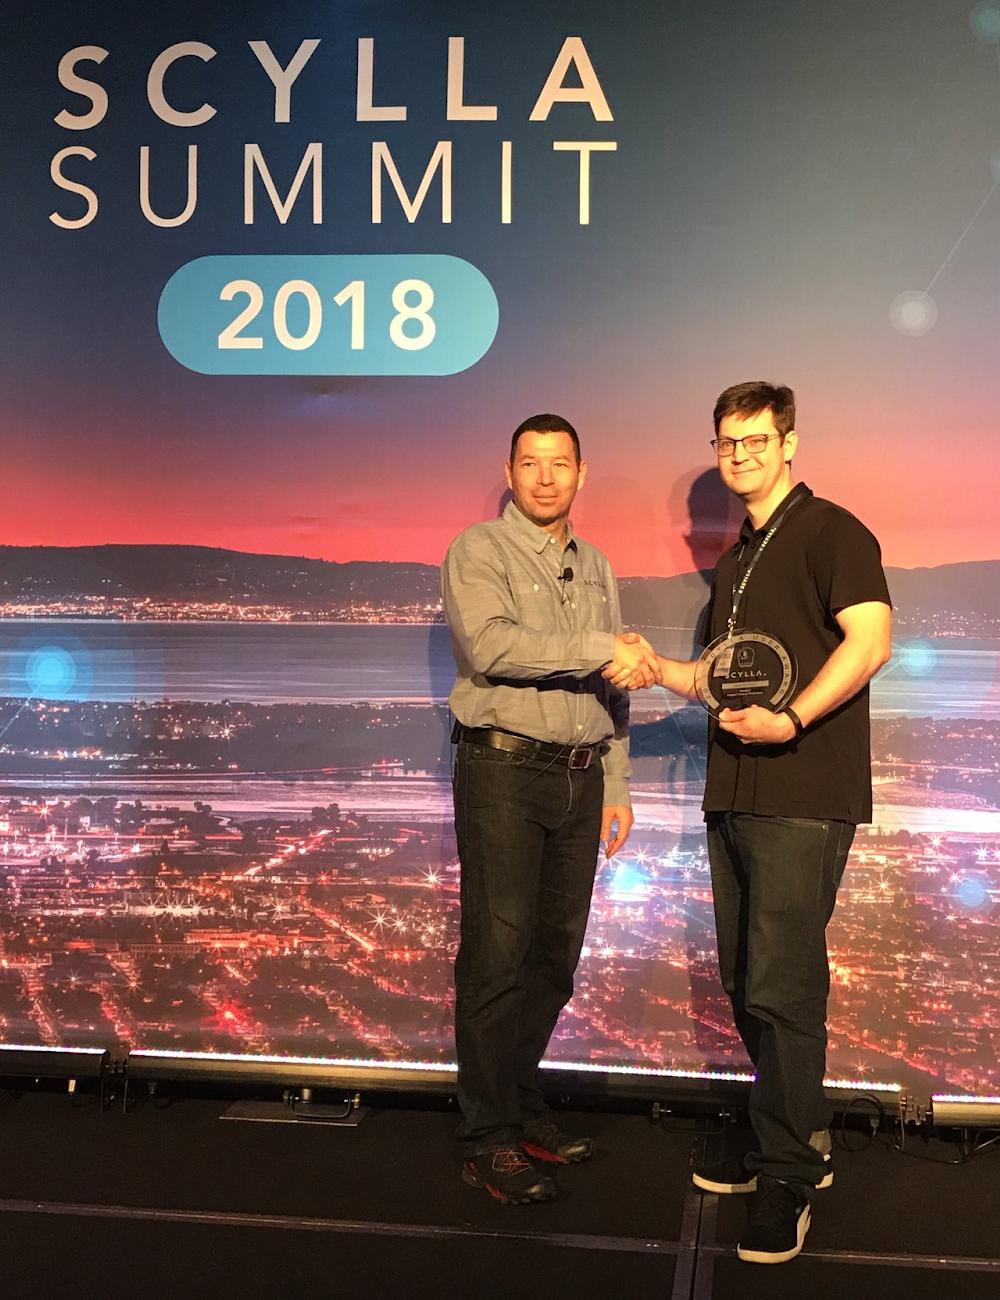 Sam Kenkel, Meshify, at Scylla Summit 2018 User Awards (with Dor Laor, ScyllaDB CEO)